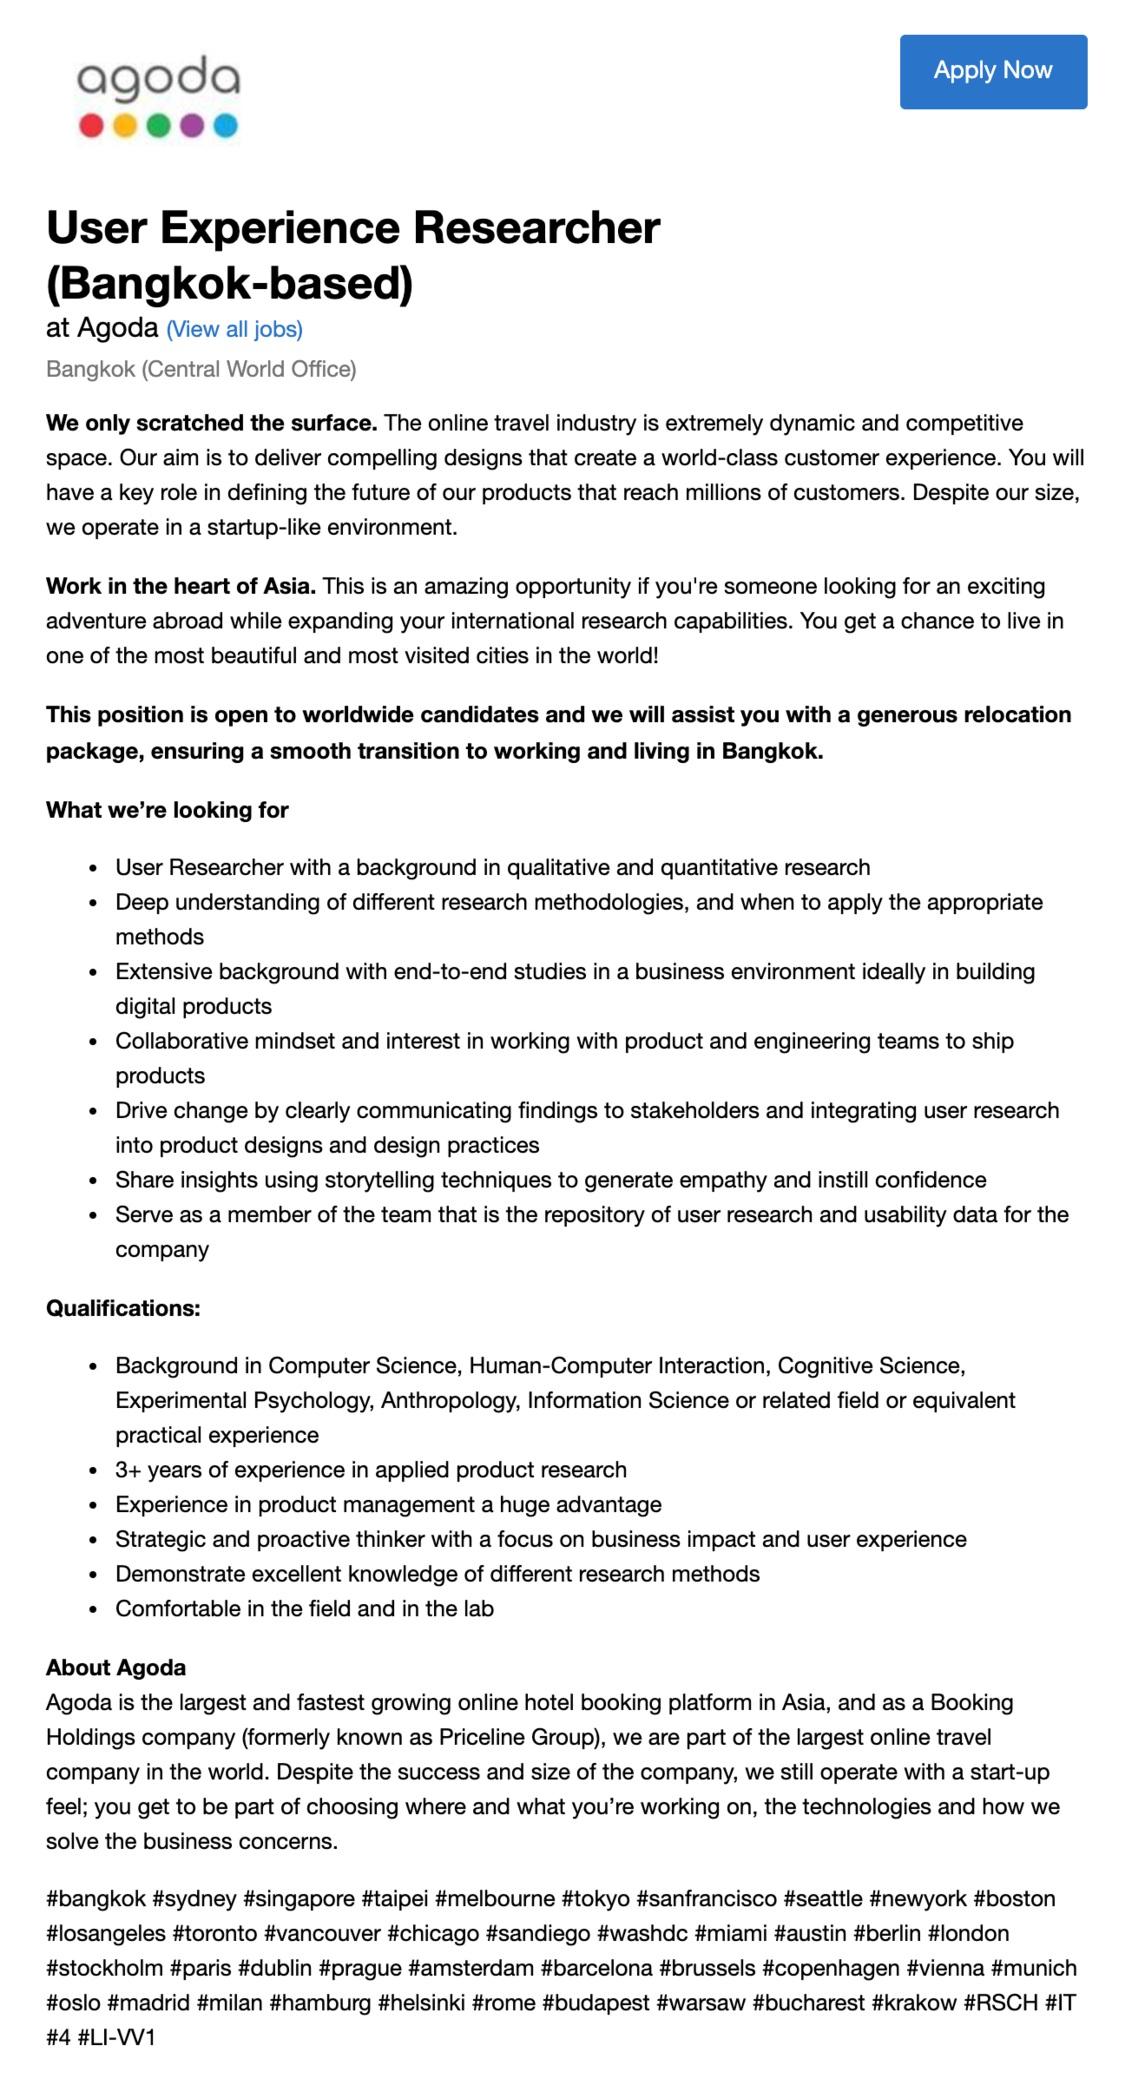 Job+Application+for+User+Experience+Researcher+%28Bangkok-based%29+at+Agoda.jpg